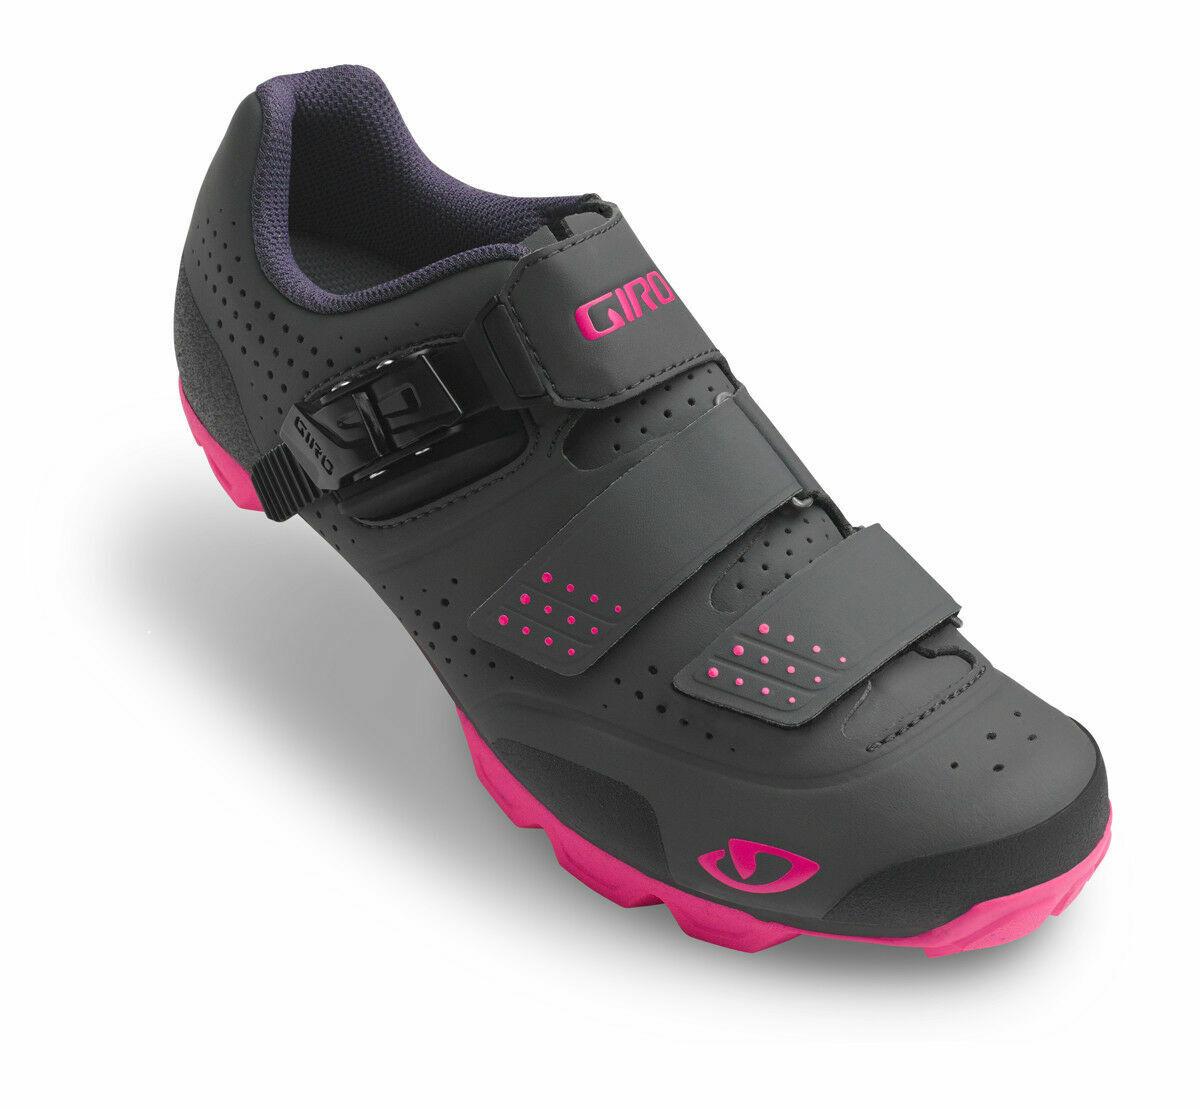 Giro Manta R - MTB Schuhe Damen Gr 37 NEU